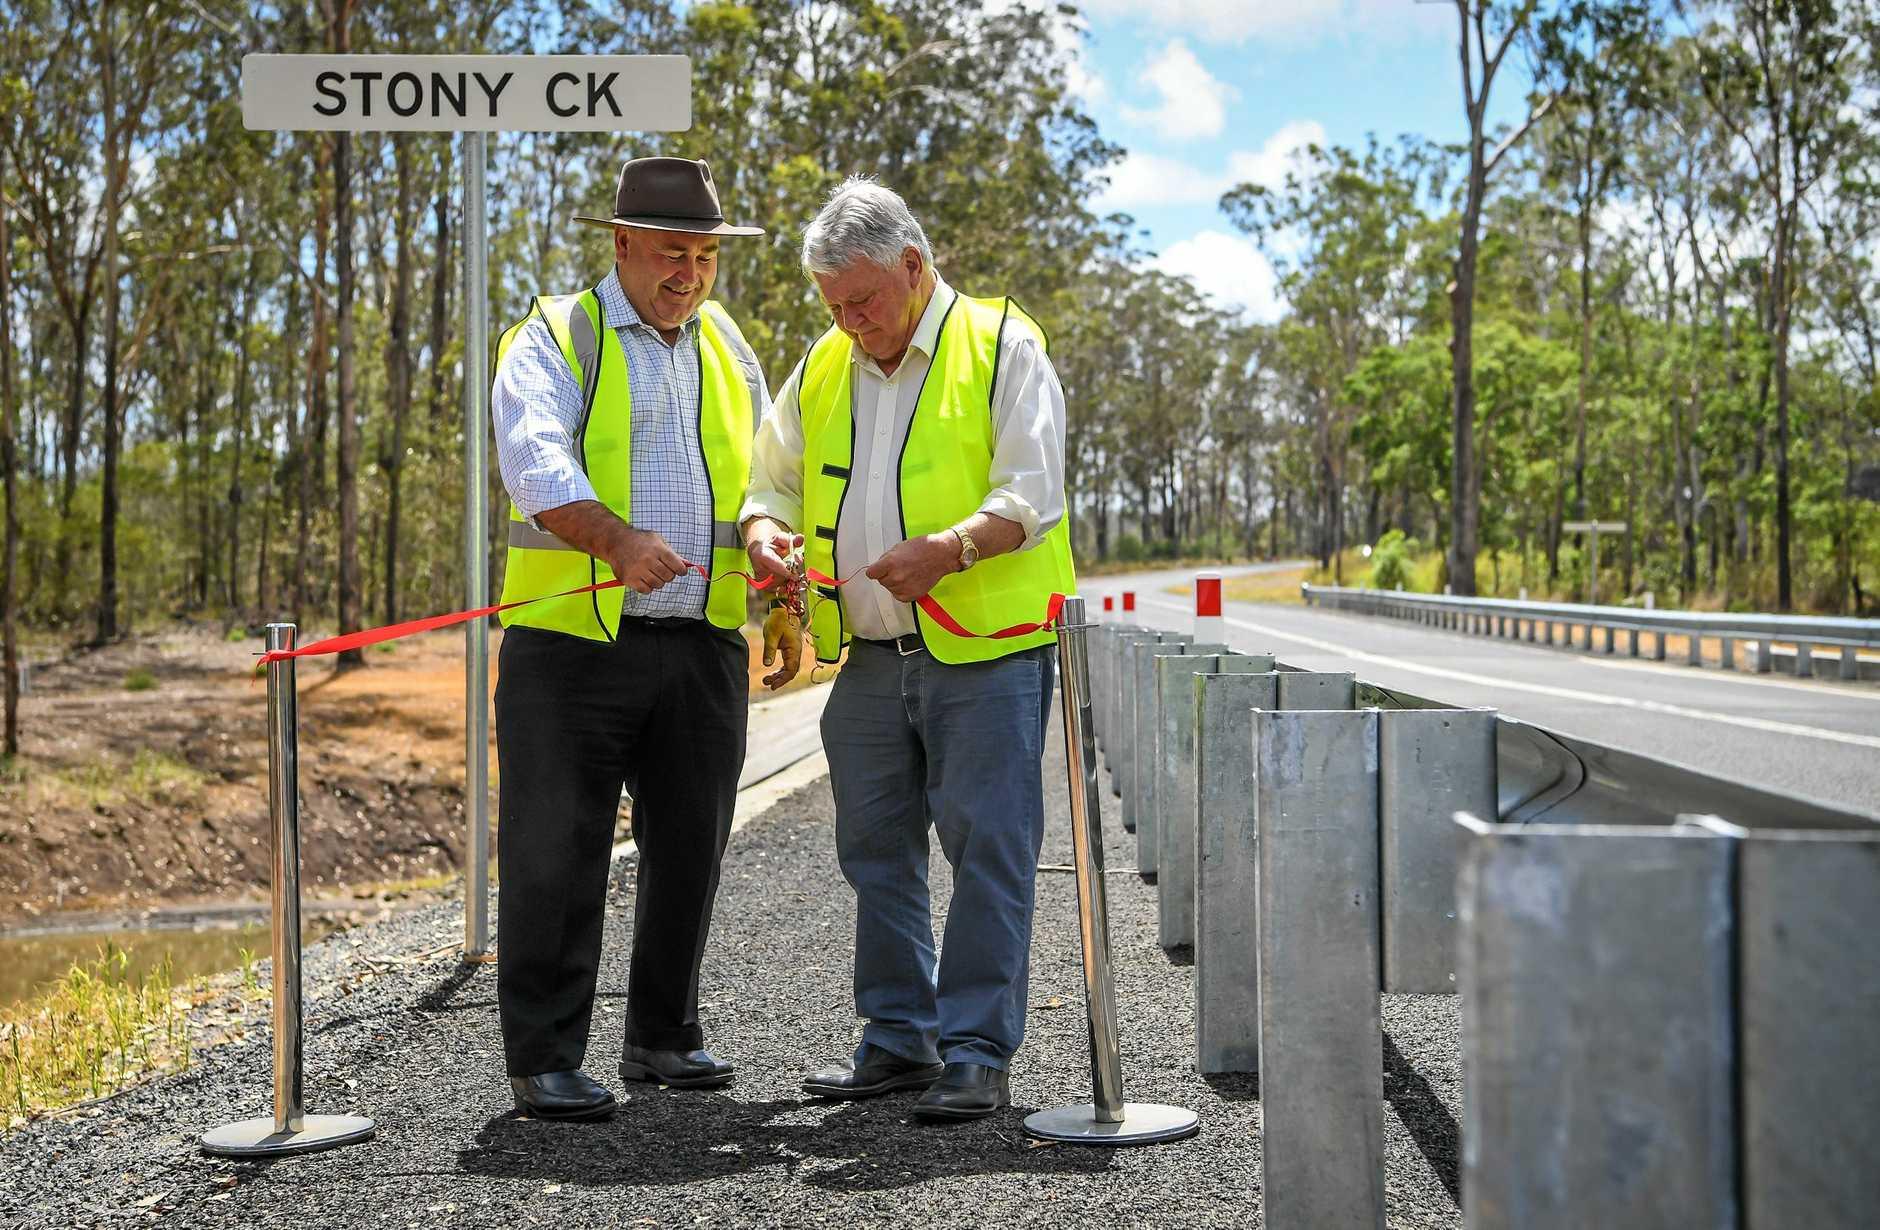 BUILDING BRIDGES: Bundaberg Mayor Jack Dempsey and Member for Flynn Ken O'Dowd open the new Stoney Creek Bridge on Bucca Rd.